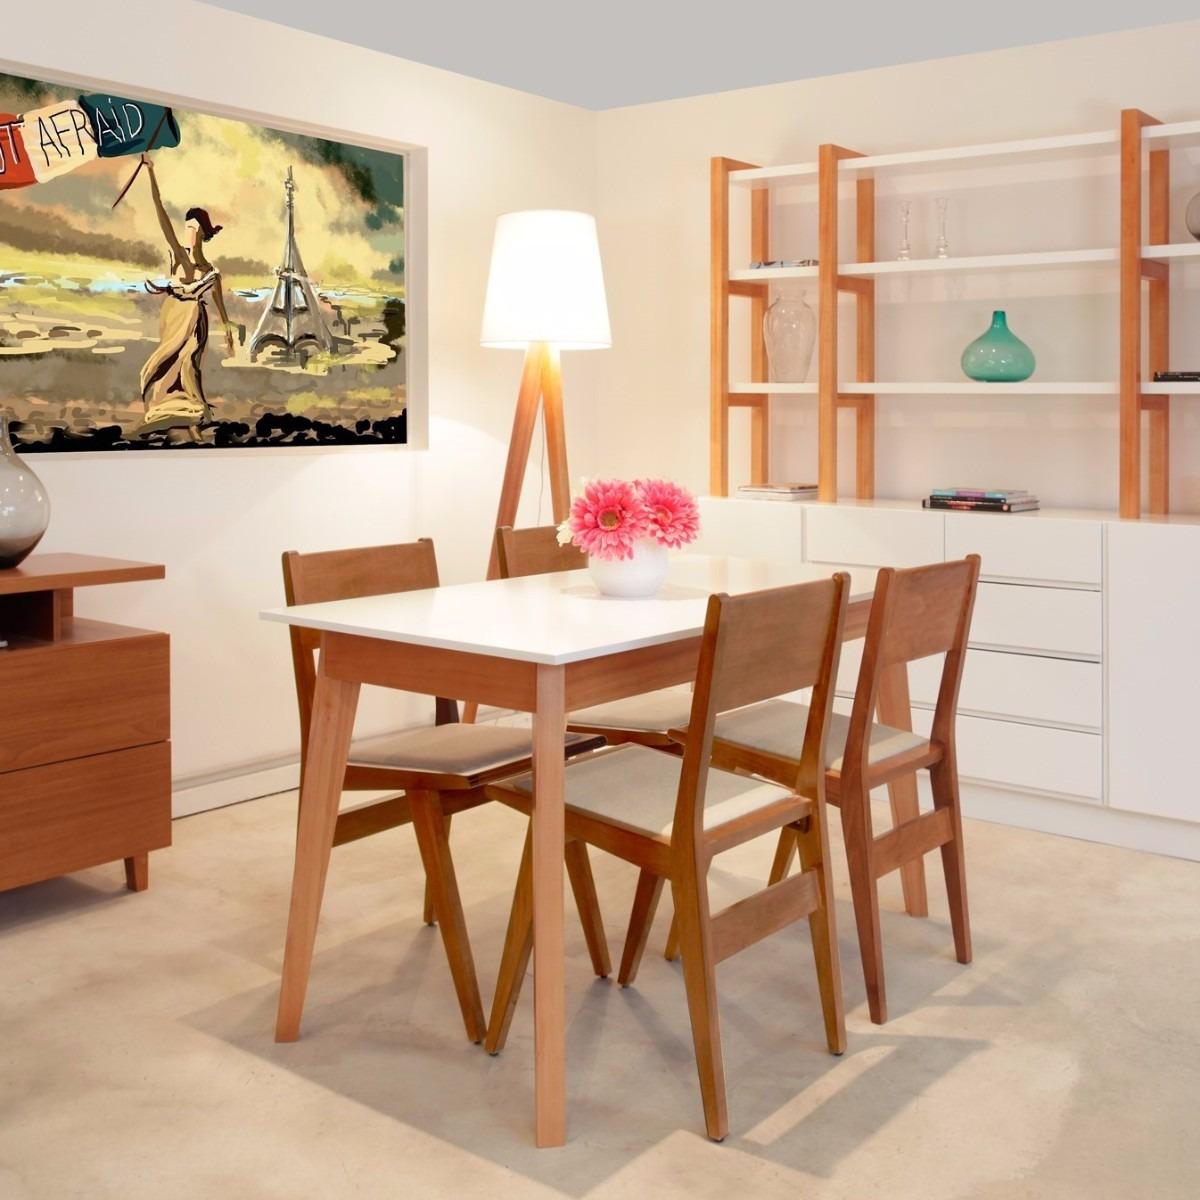 Mesa Comedor Rectangular Diseño Escandinavo Forbidan Muebles